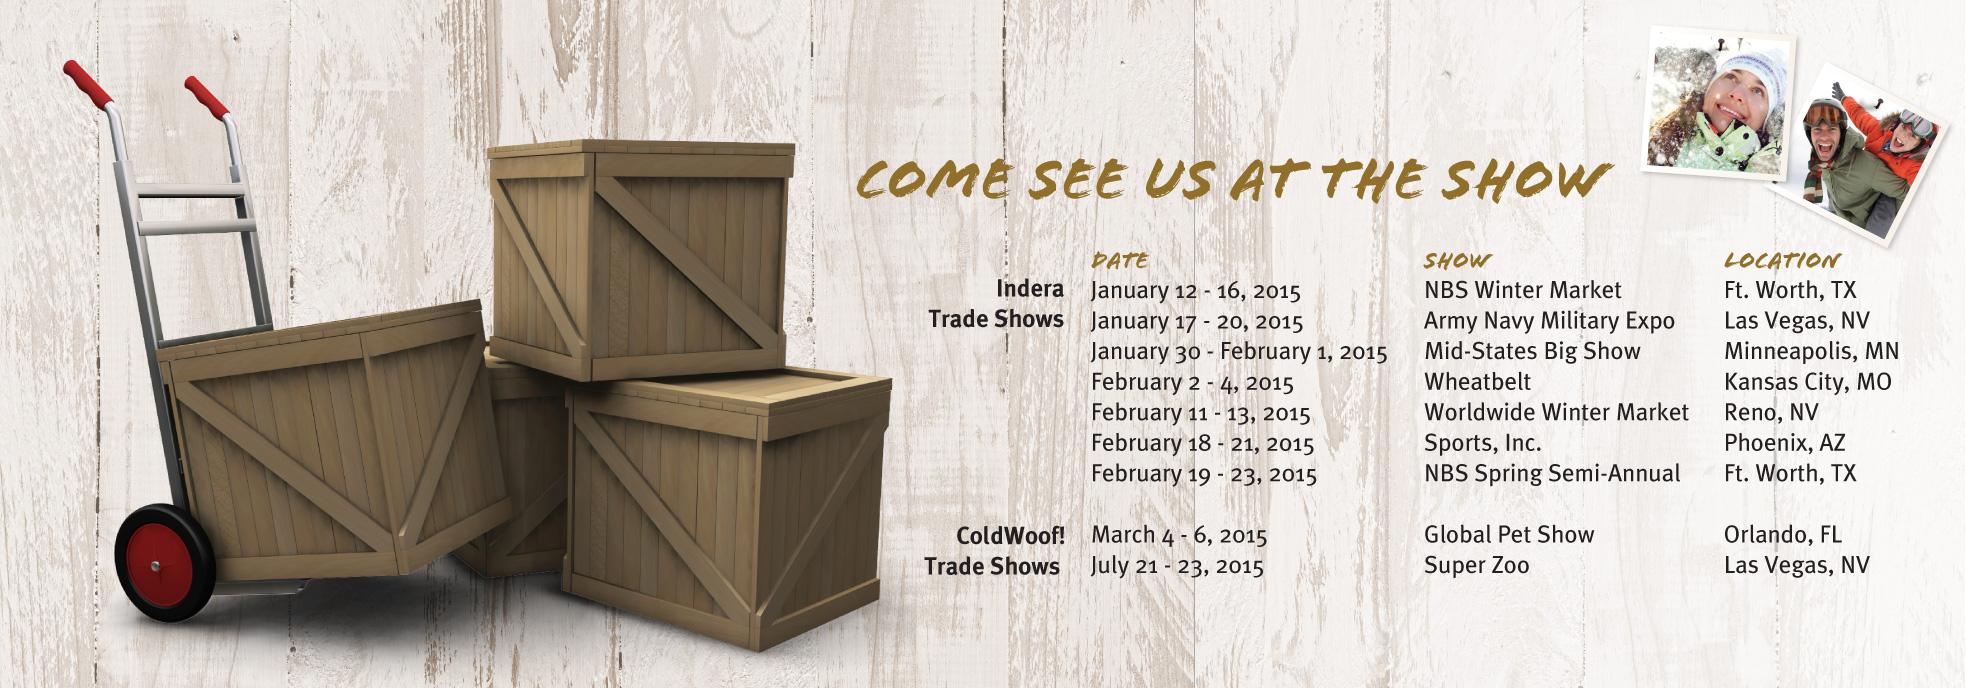 http://www.inderamills.com/wp-content/uploads/2014/11/Trade-Show-Slider.jpg